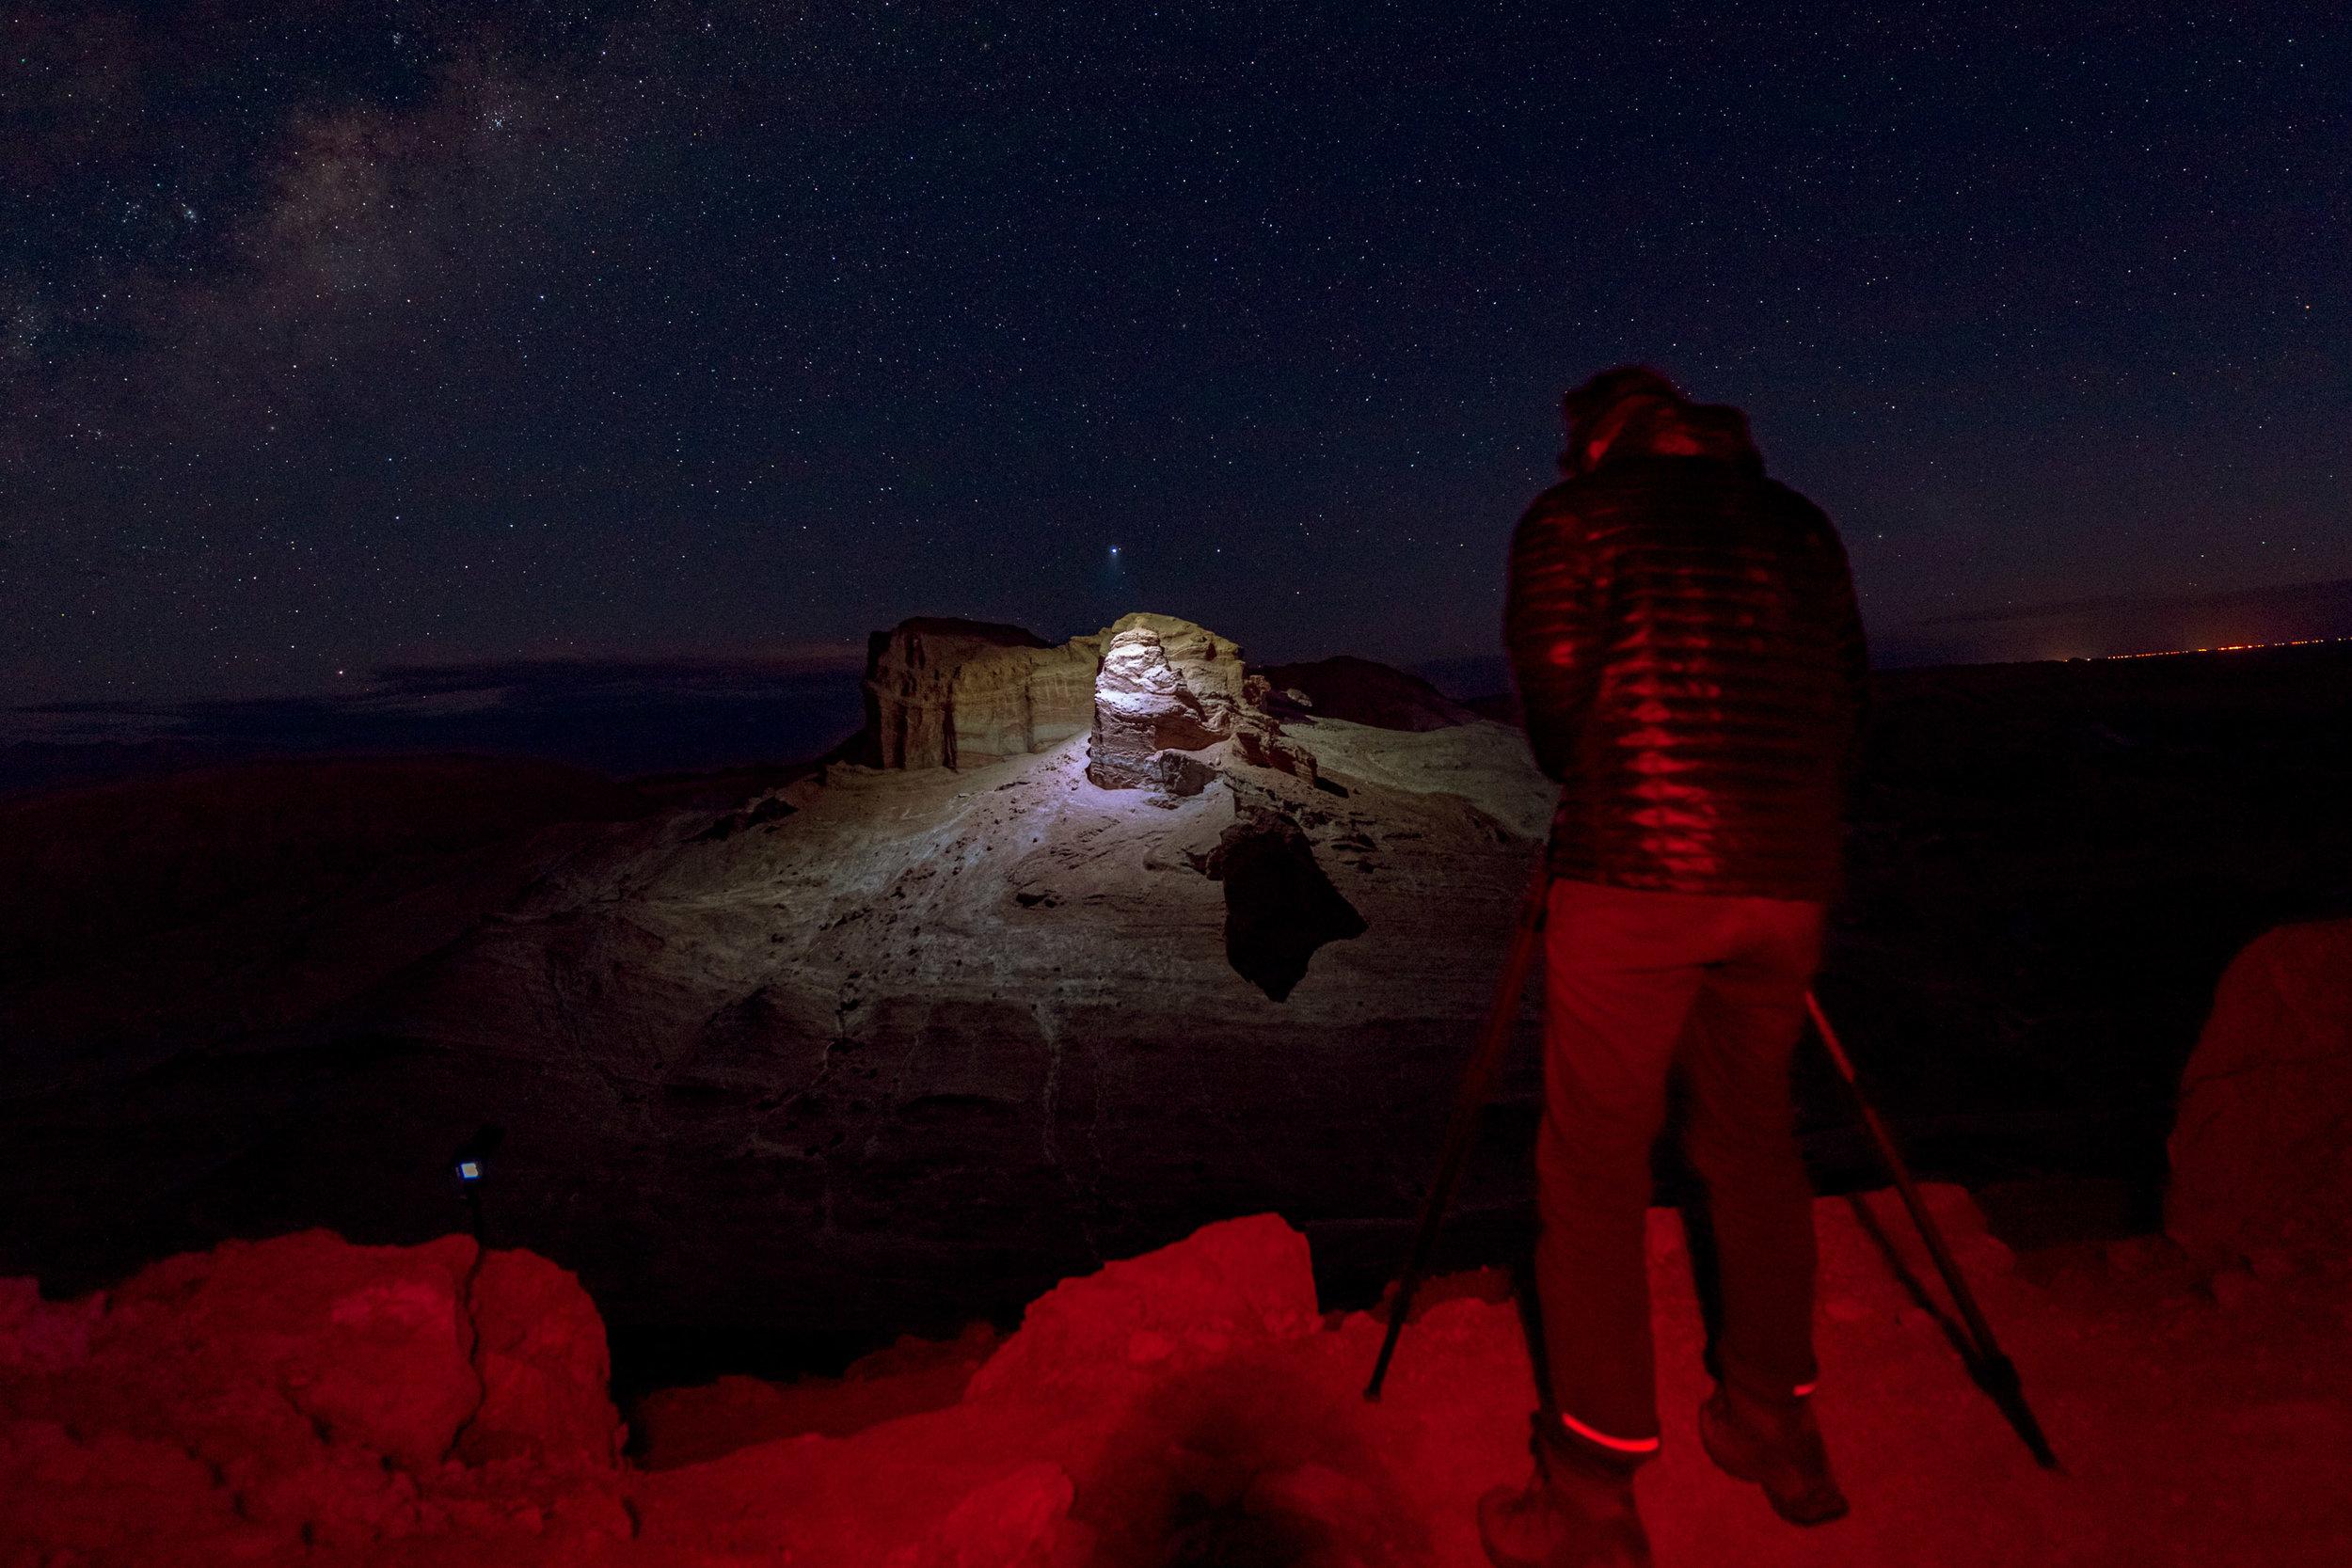 evanbdudley-Chile-Eclipse-19-0278.jpg